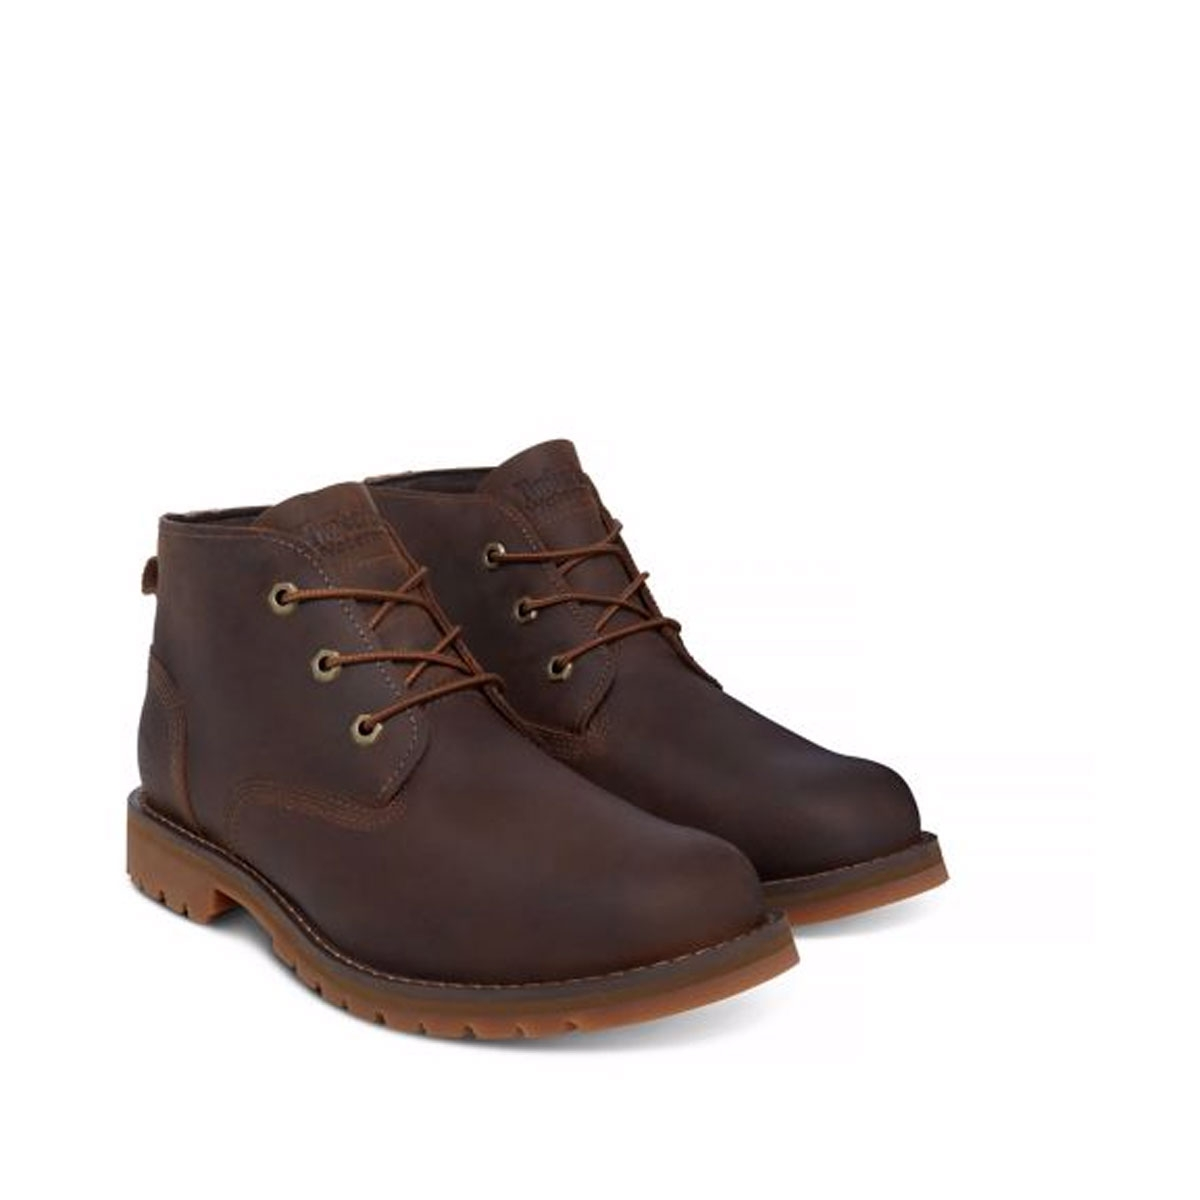 0ace8b30c91 Timberland Earthkeepers Larchmont WP Waterproof Chukka Boots (Men's) -  Gaucho Saddleback (Dark Brown) Full Grain